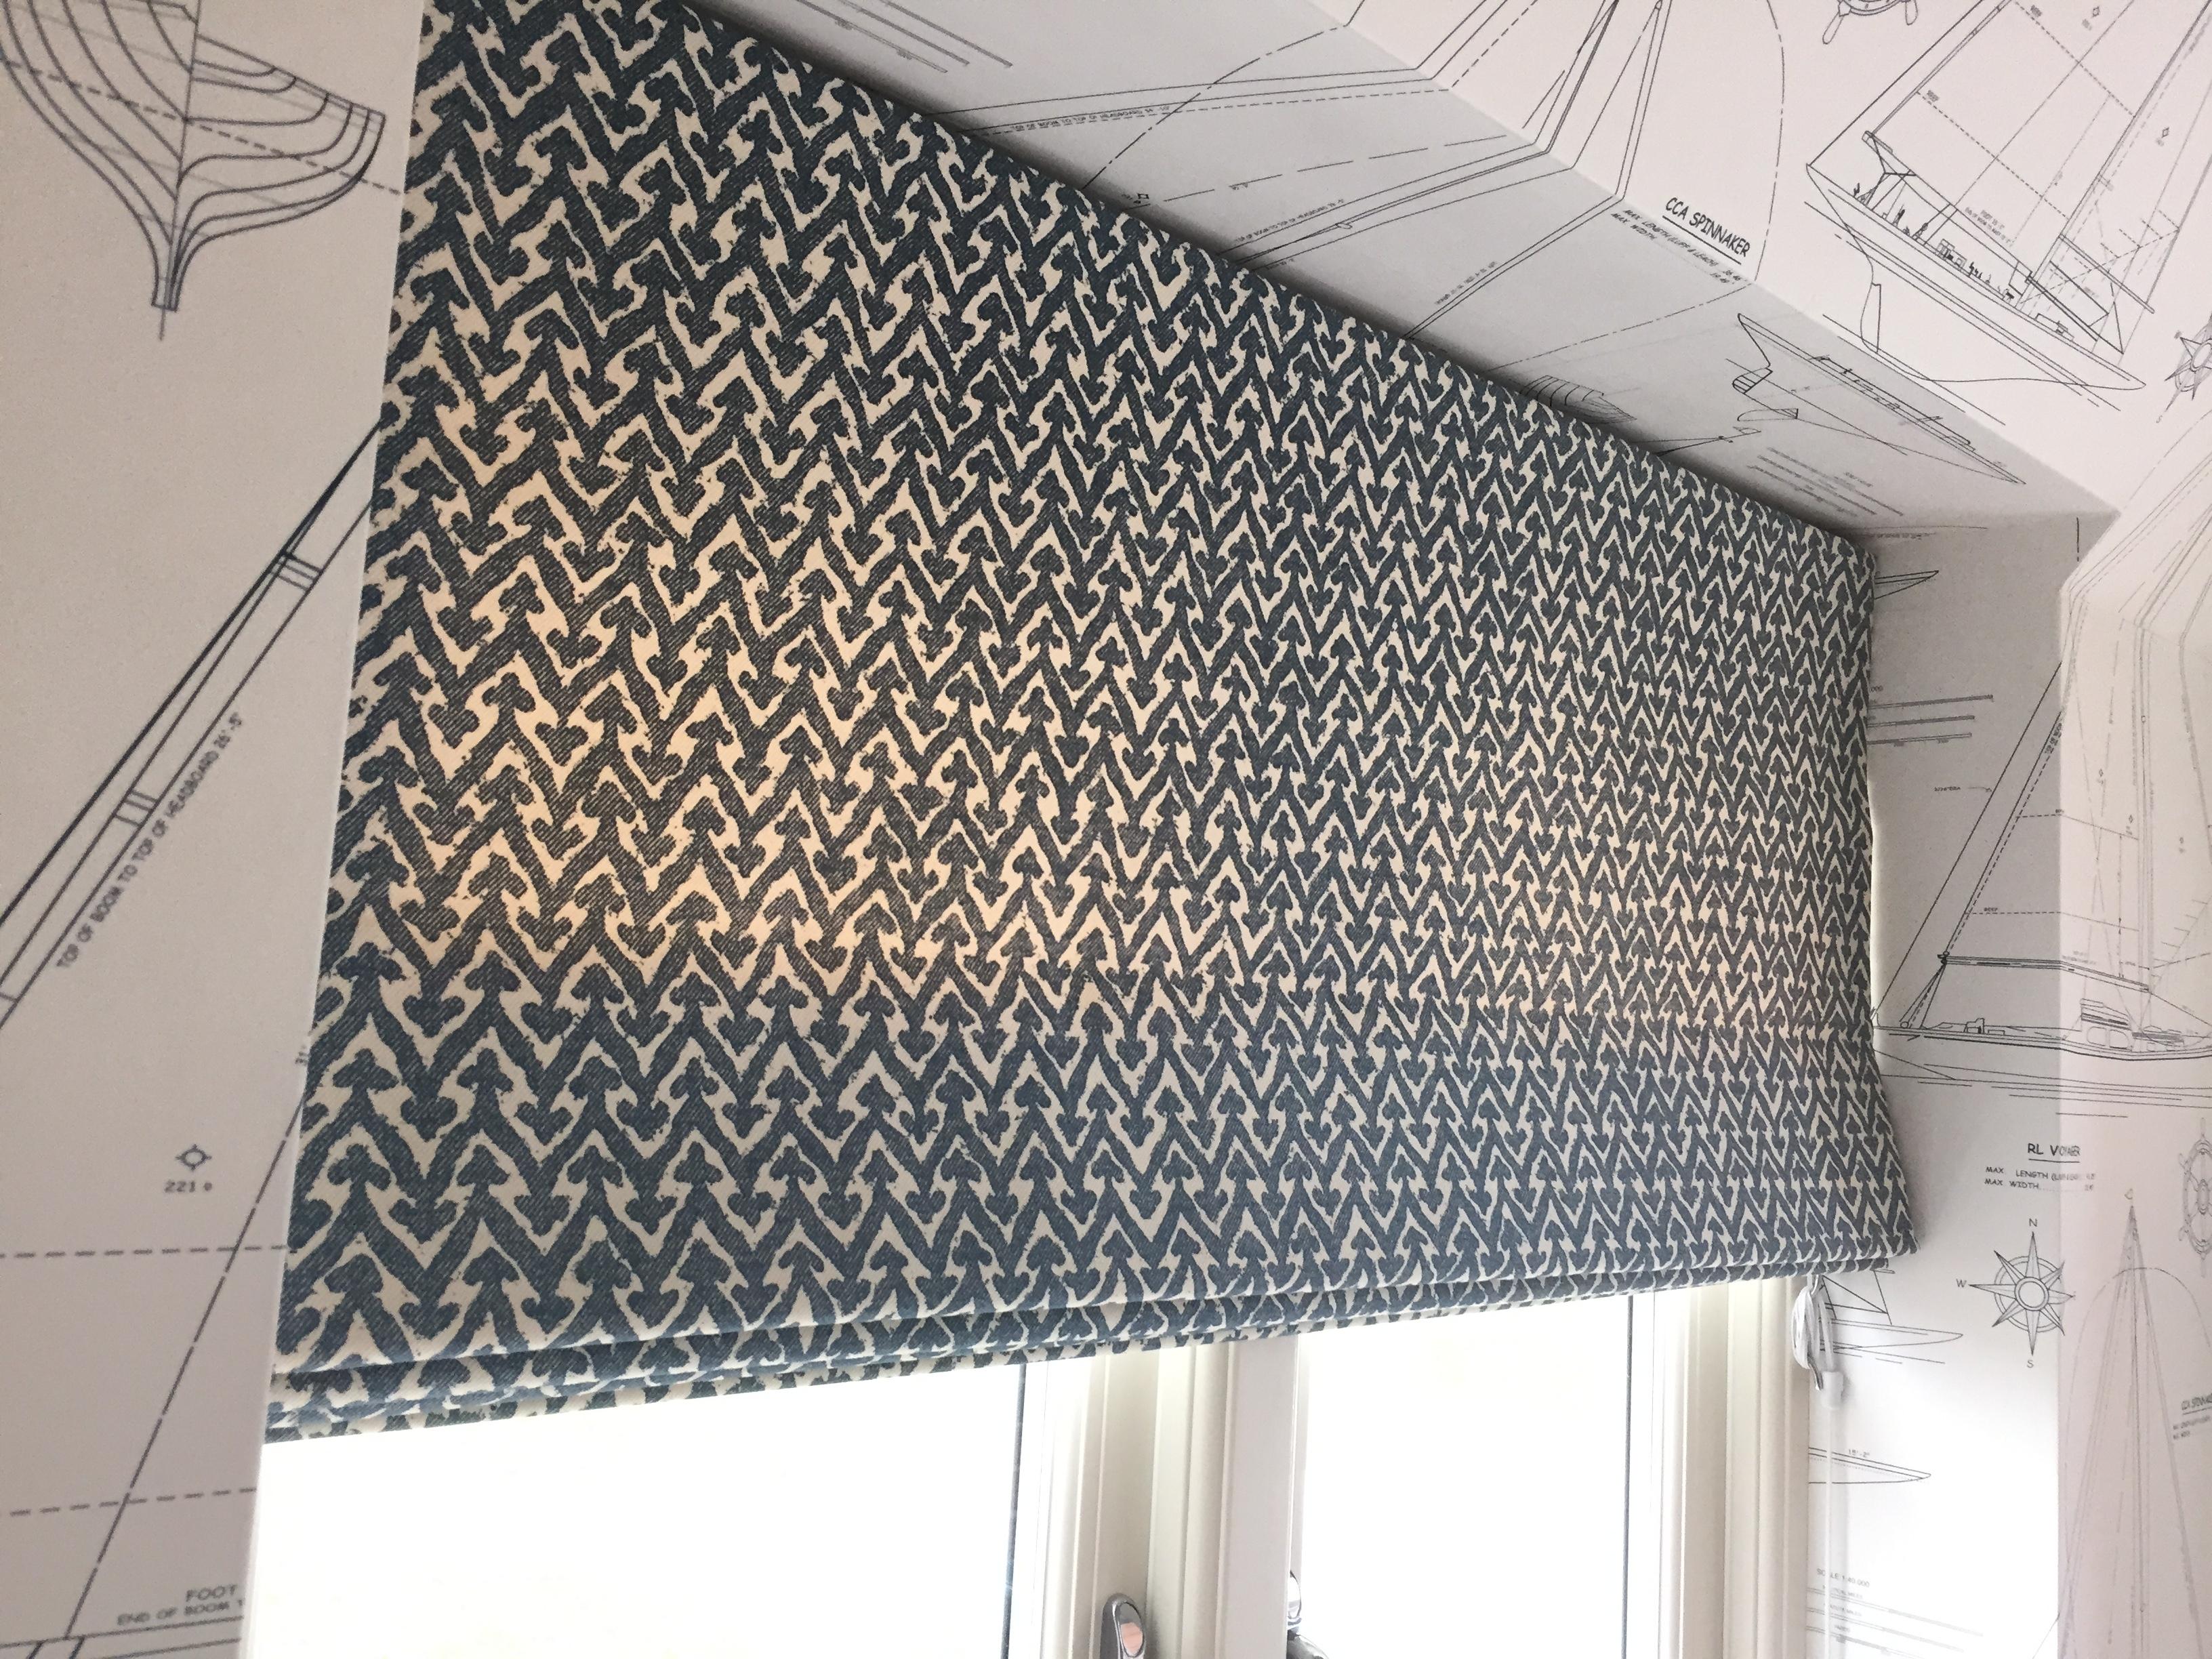 Handmade Roman Blind Victoria Clark Interiors Fabric Ian Inside Handmade Roman Blinds (View 11 of 15)